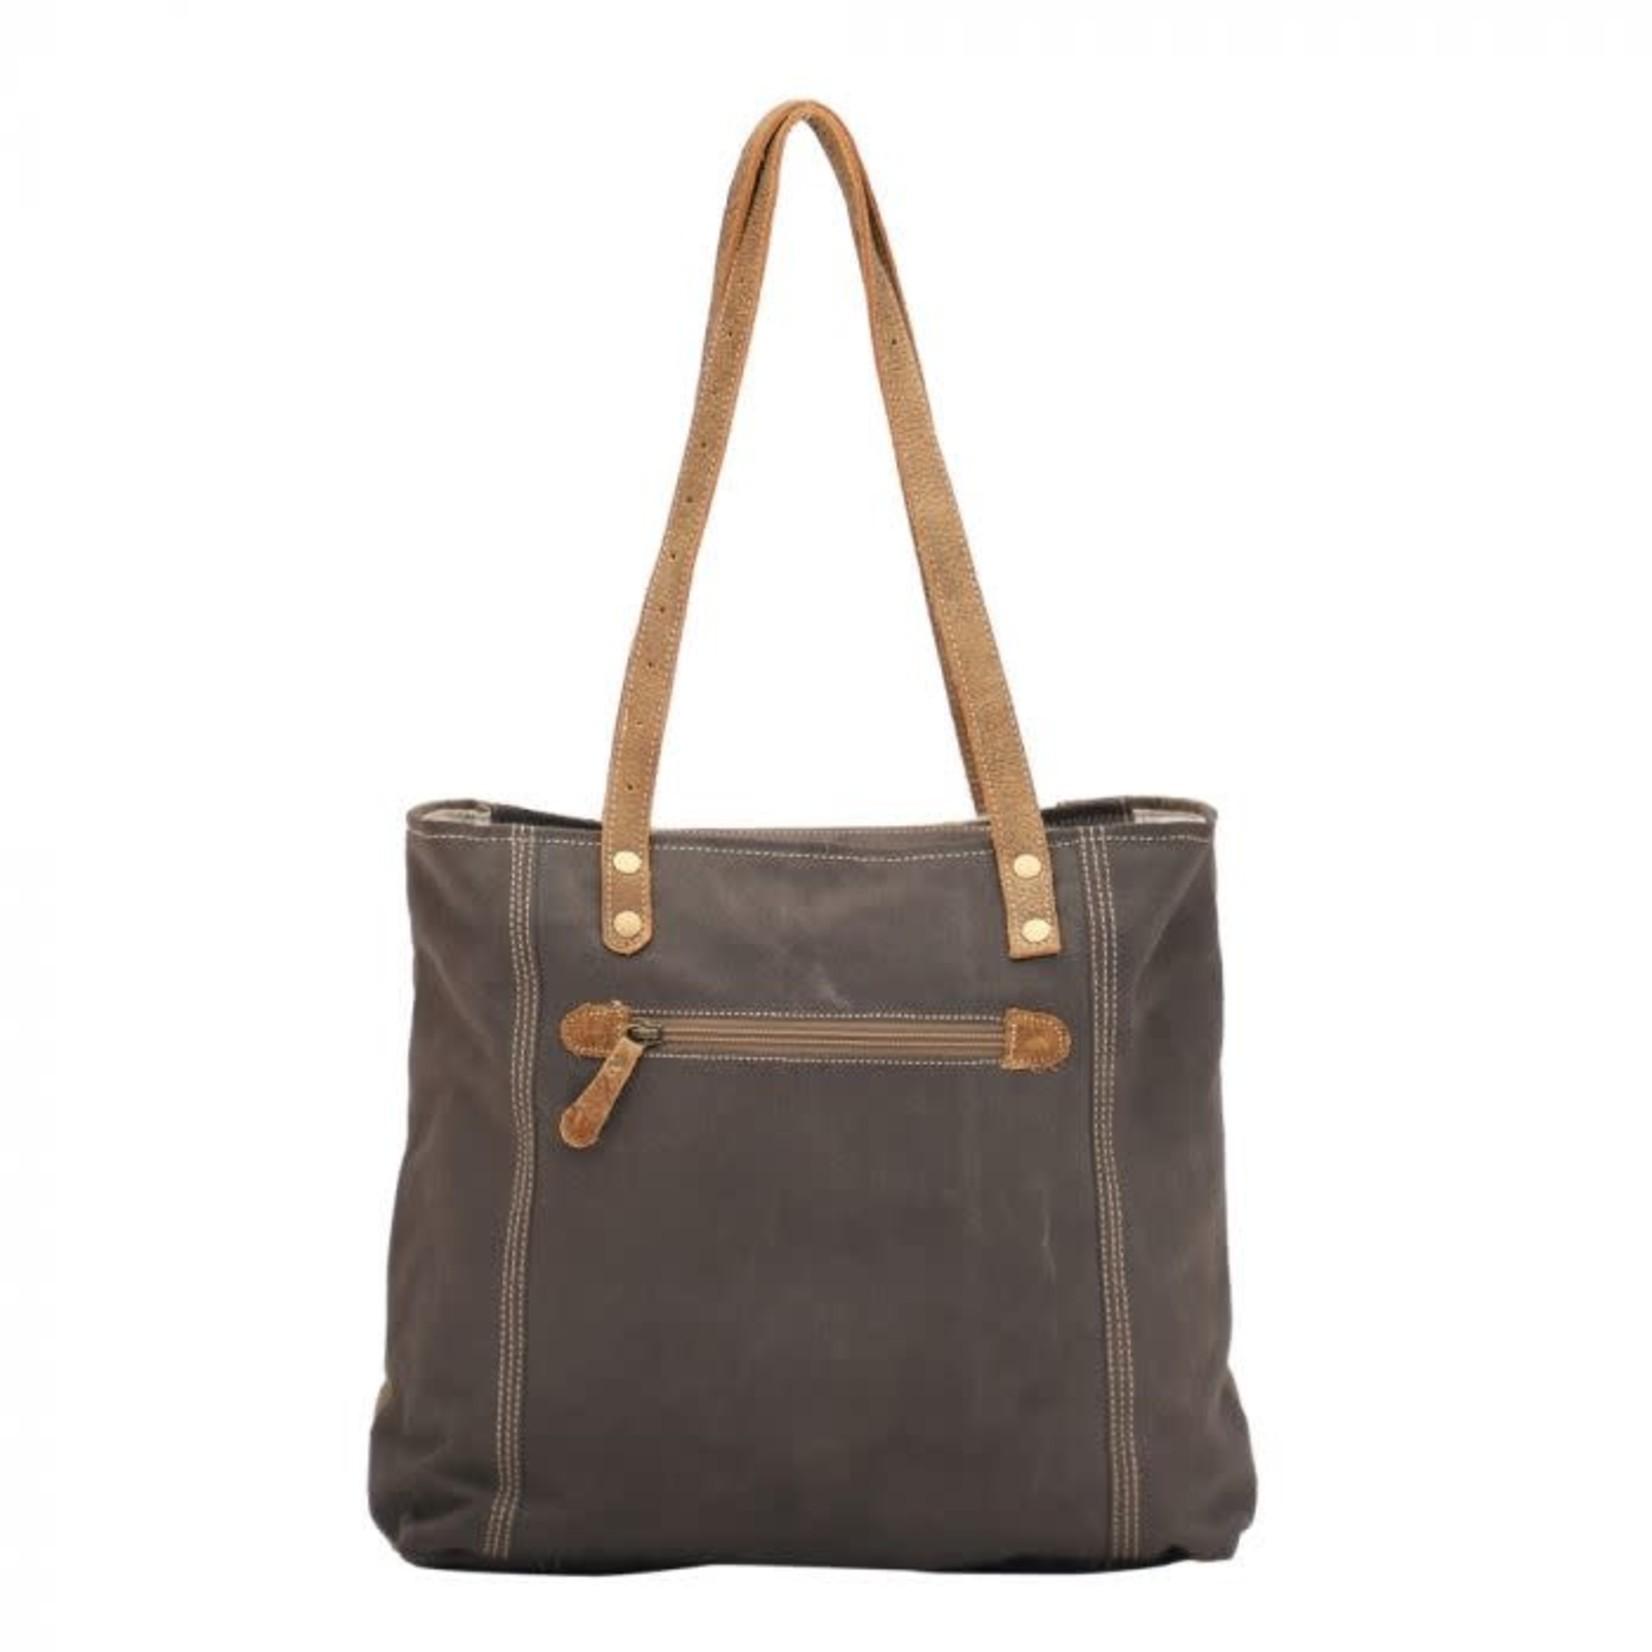 Myra Bag Bag: Unique Key Tote